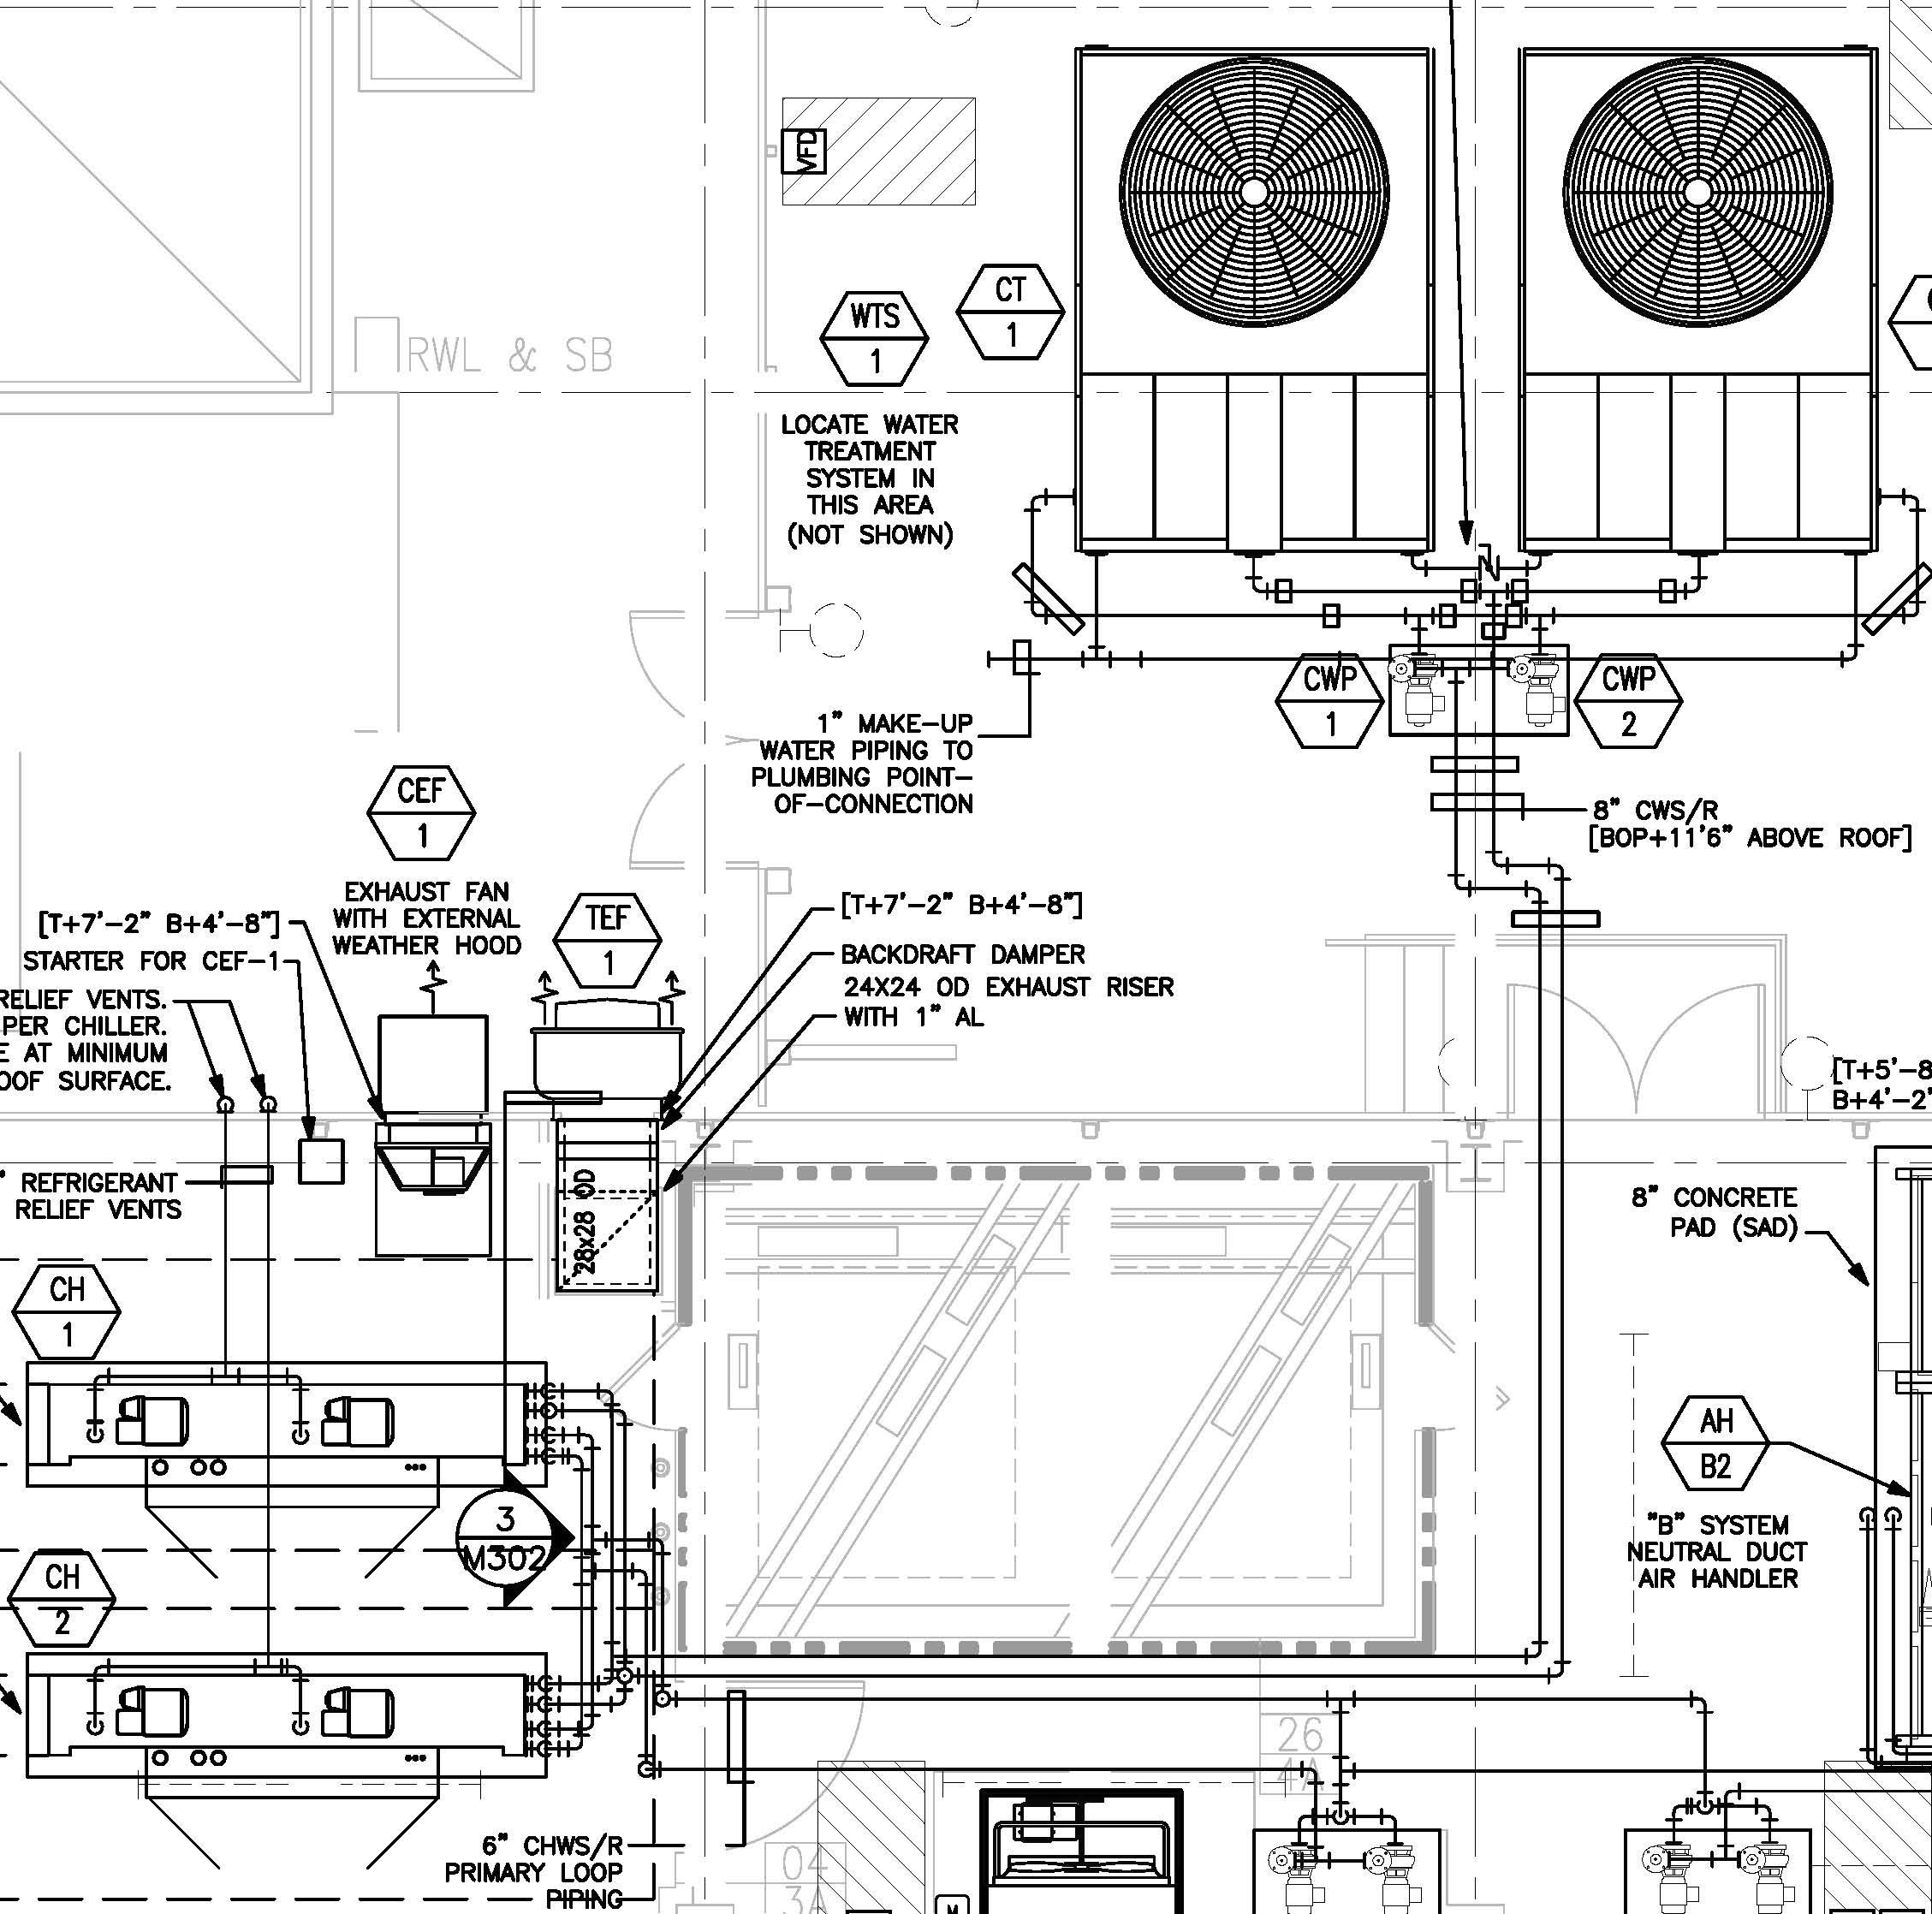 rheem rte 13 wiring diagram free wiring diagram Rheem Heat Pump Epfg-030Jaz Wiring